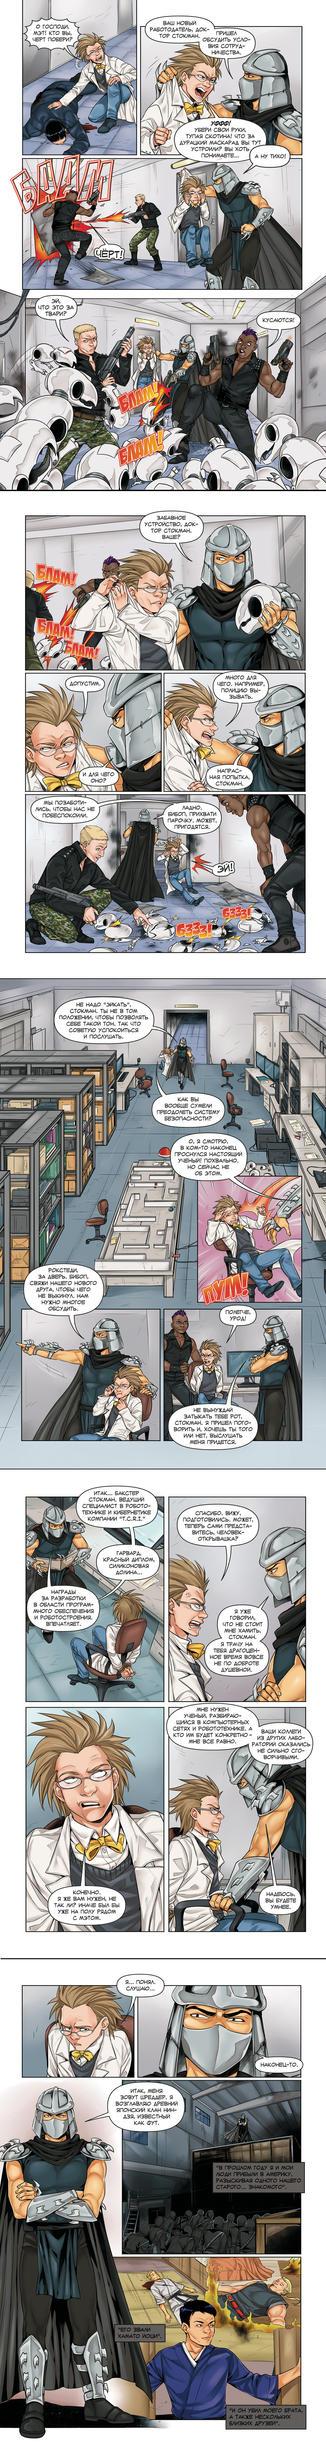 Origins 3: Baxter Stockman 2 by LinART